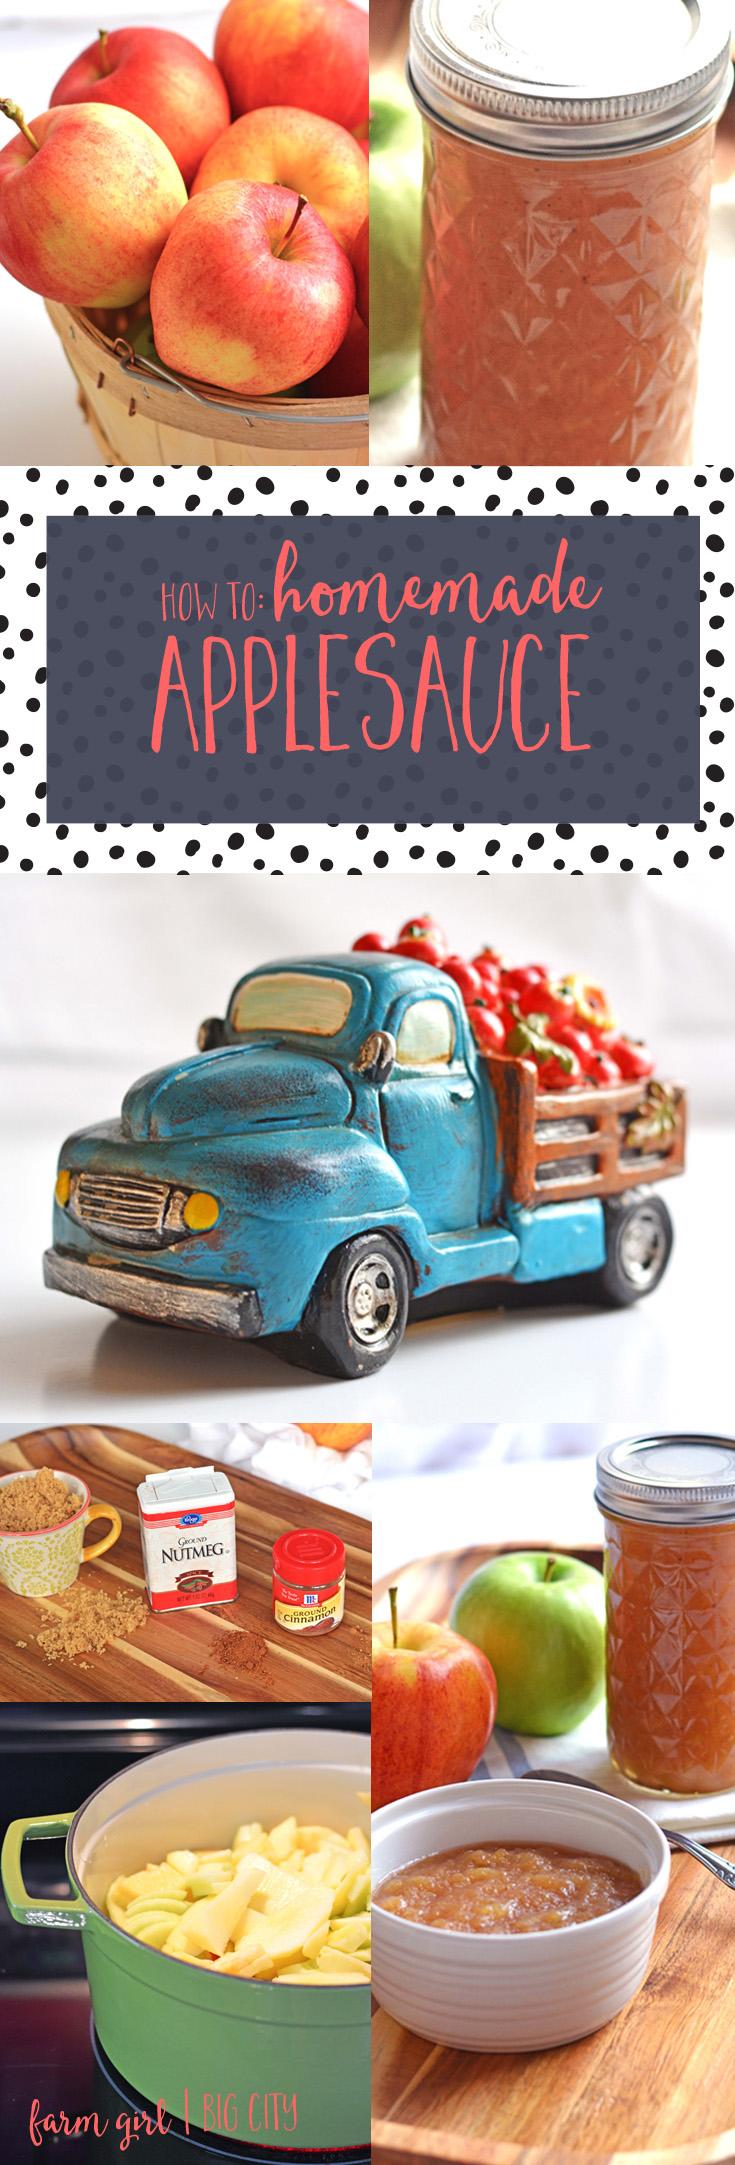 How to make and preserve homemade applesauce (via farm girl big city)